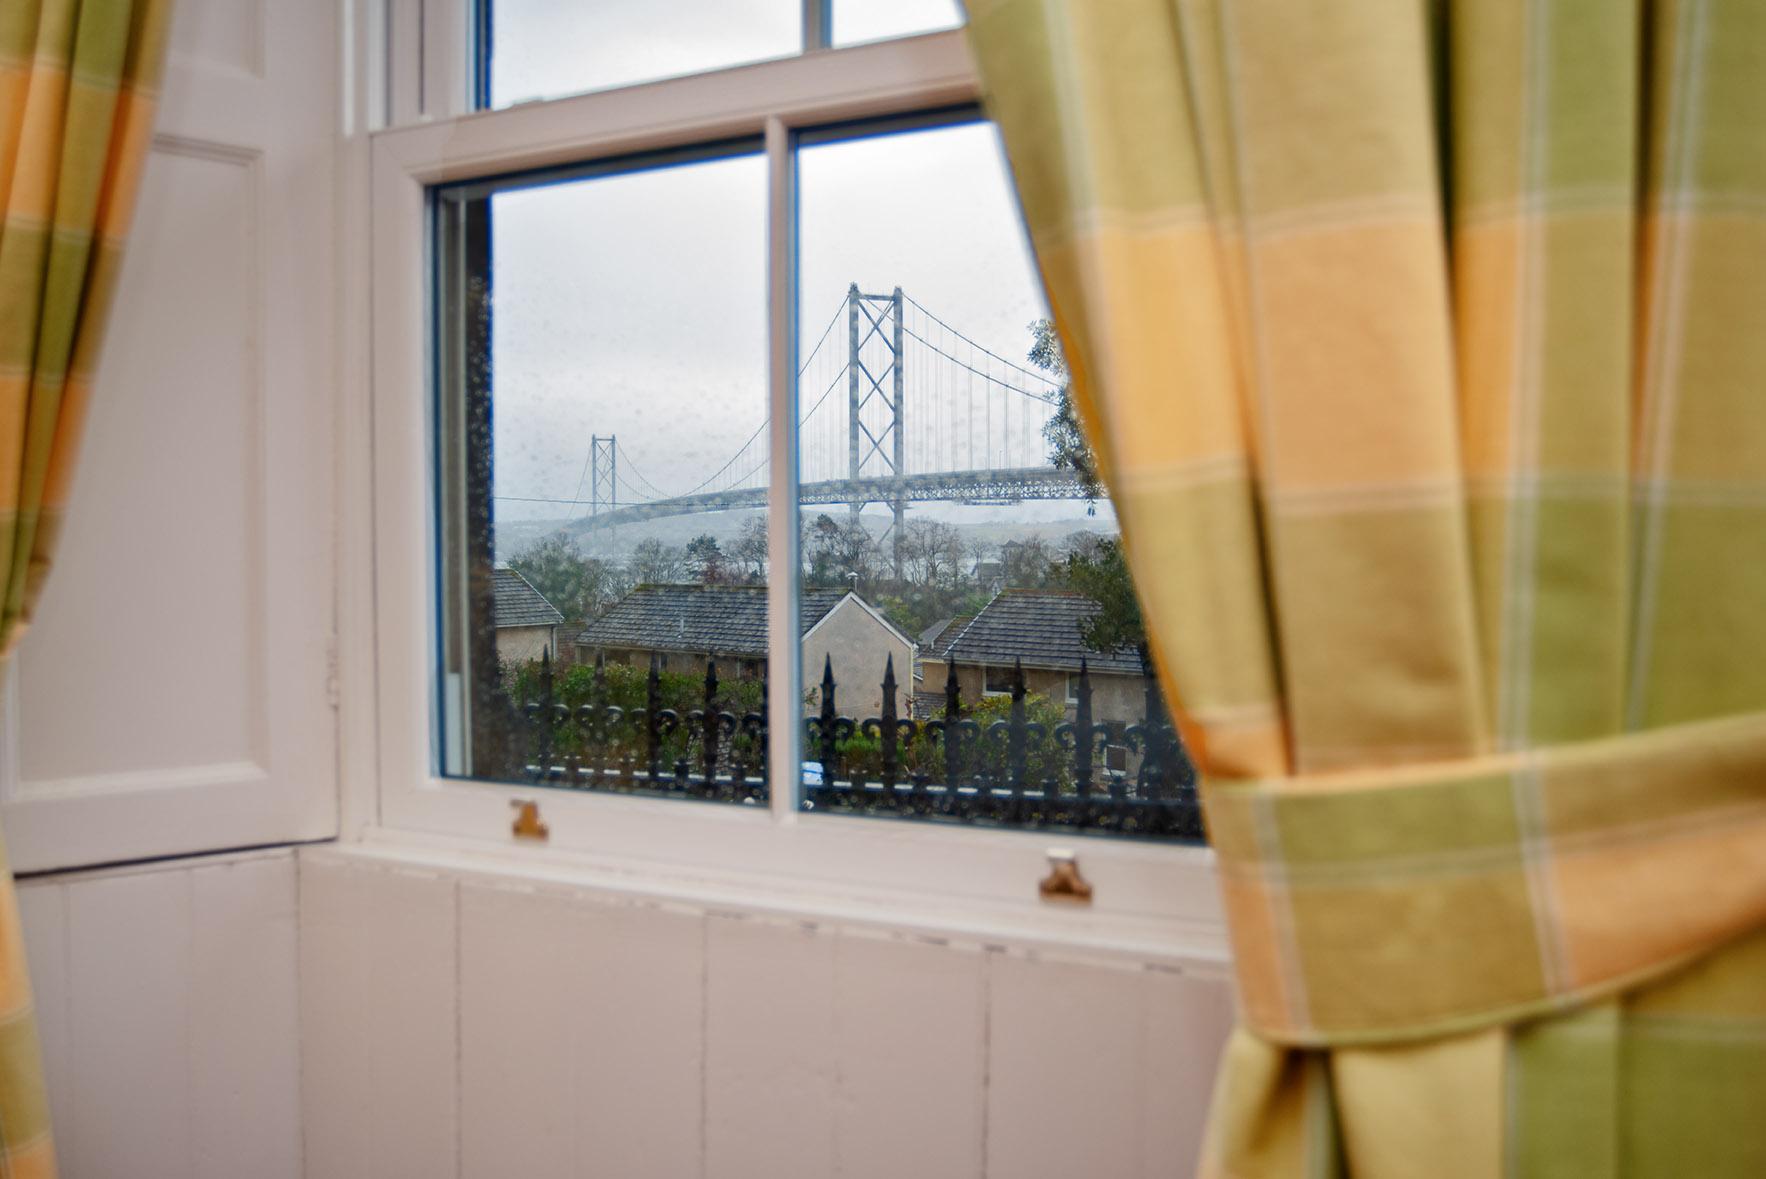 Window at The Lodge, Crossgates, Dunfermline